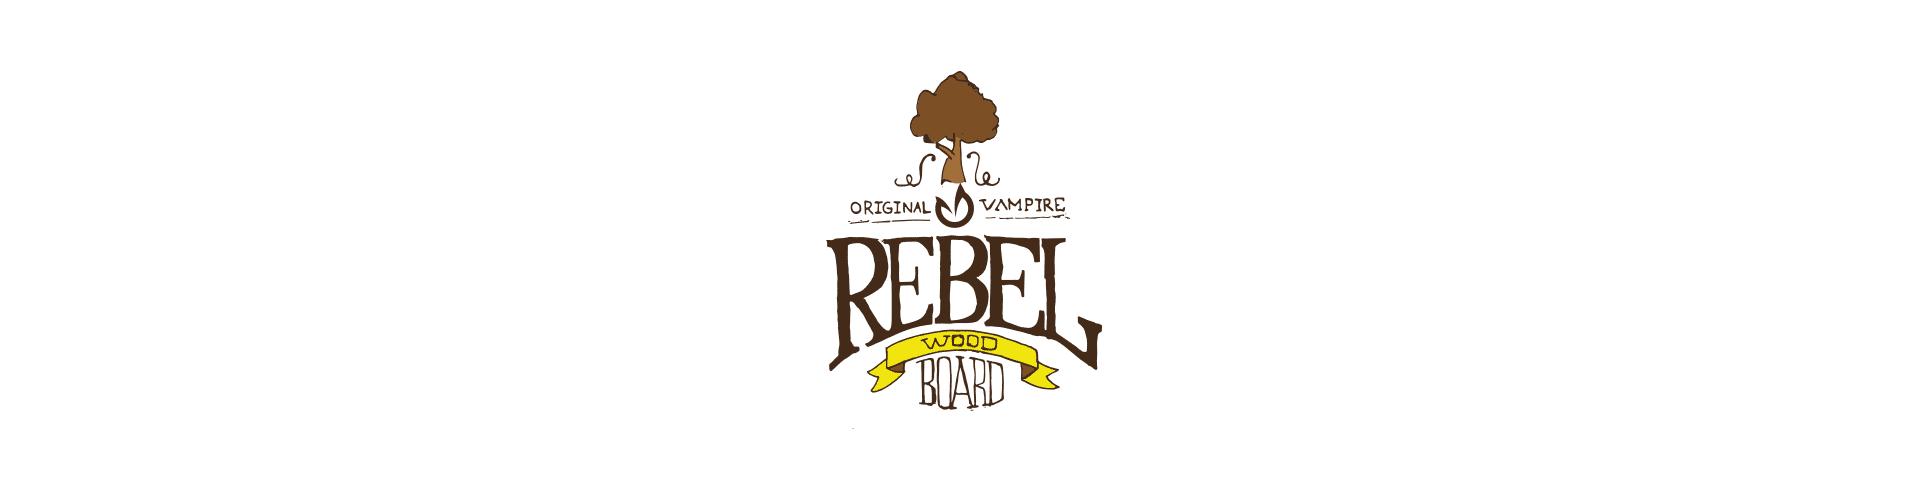 Vampire Kiteboards Typedesign - Rebel 2014